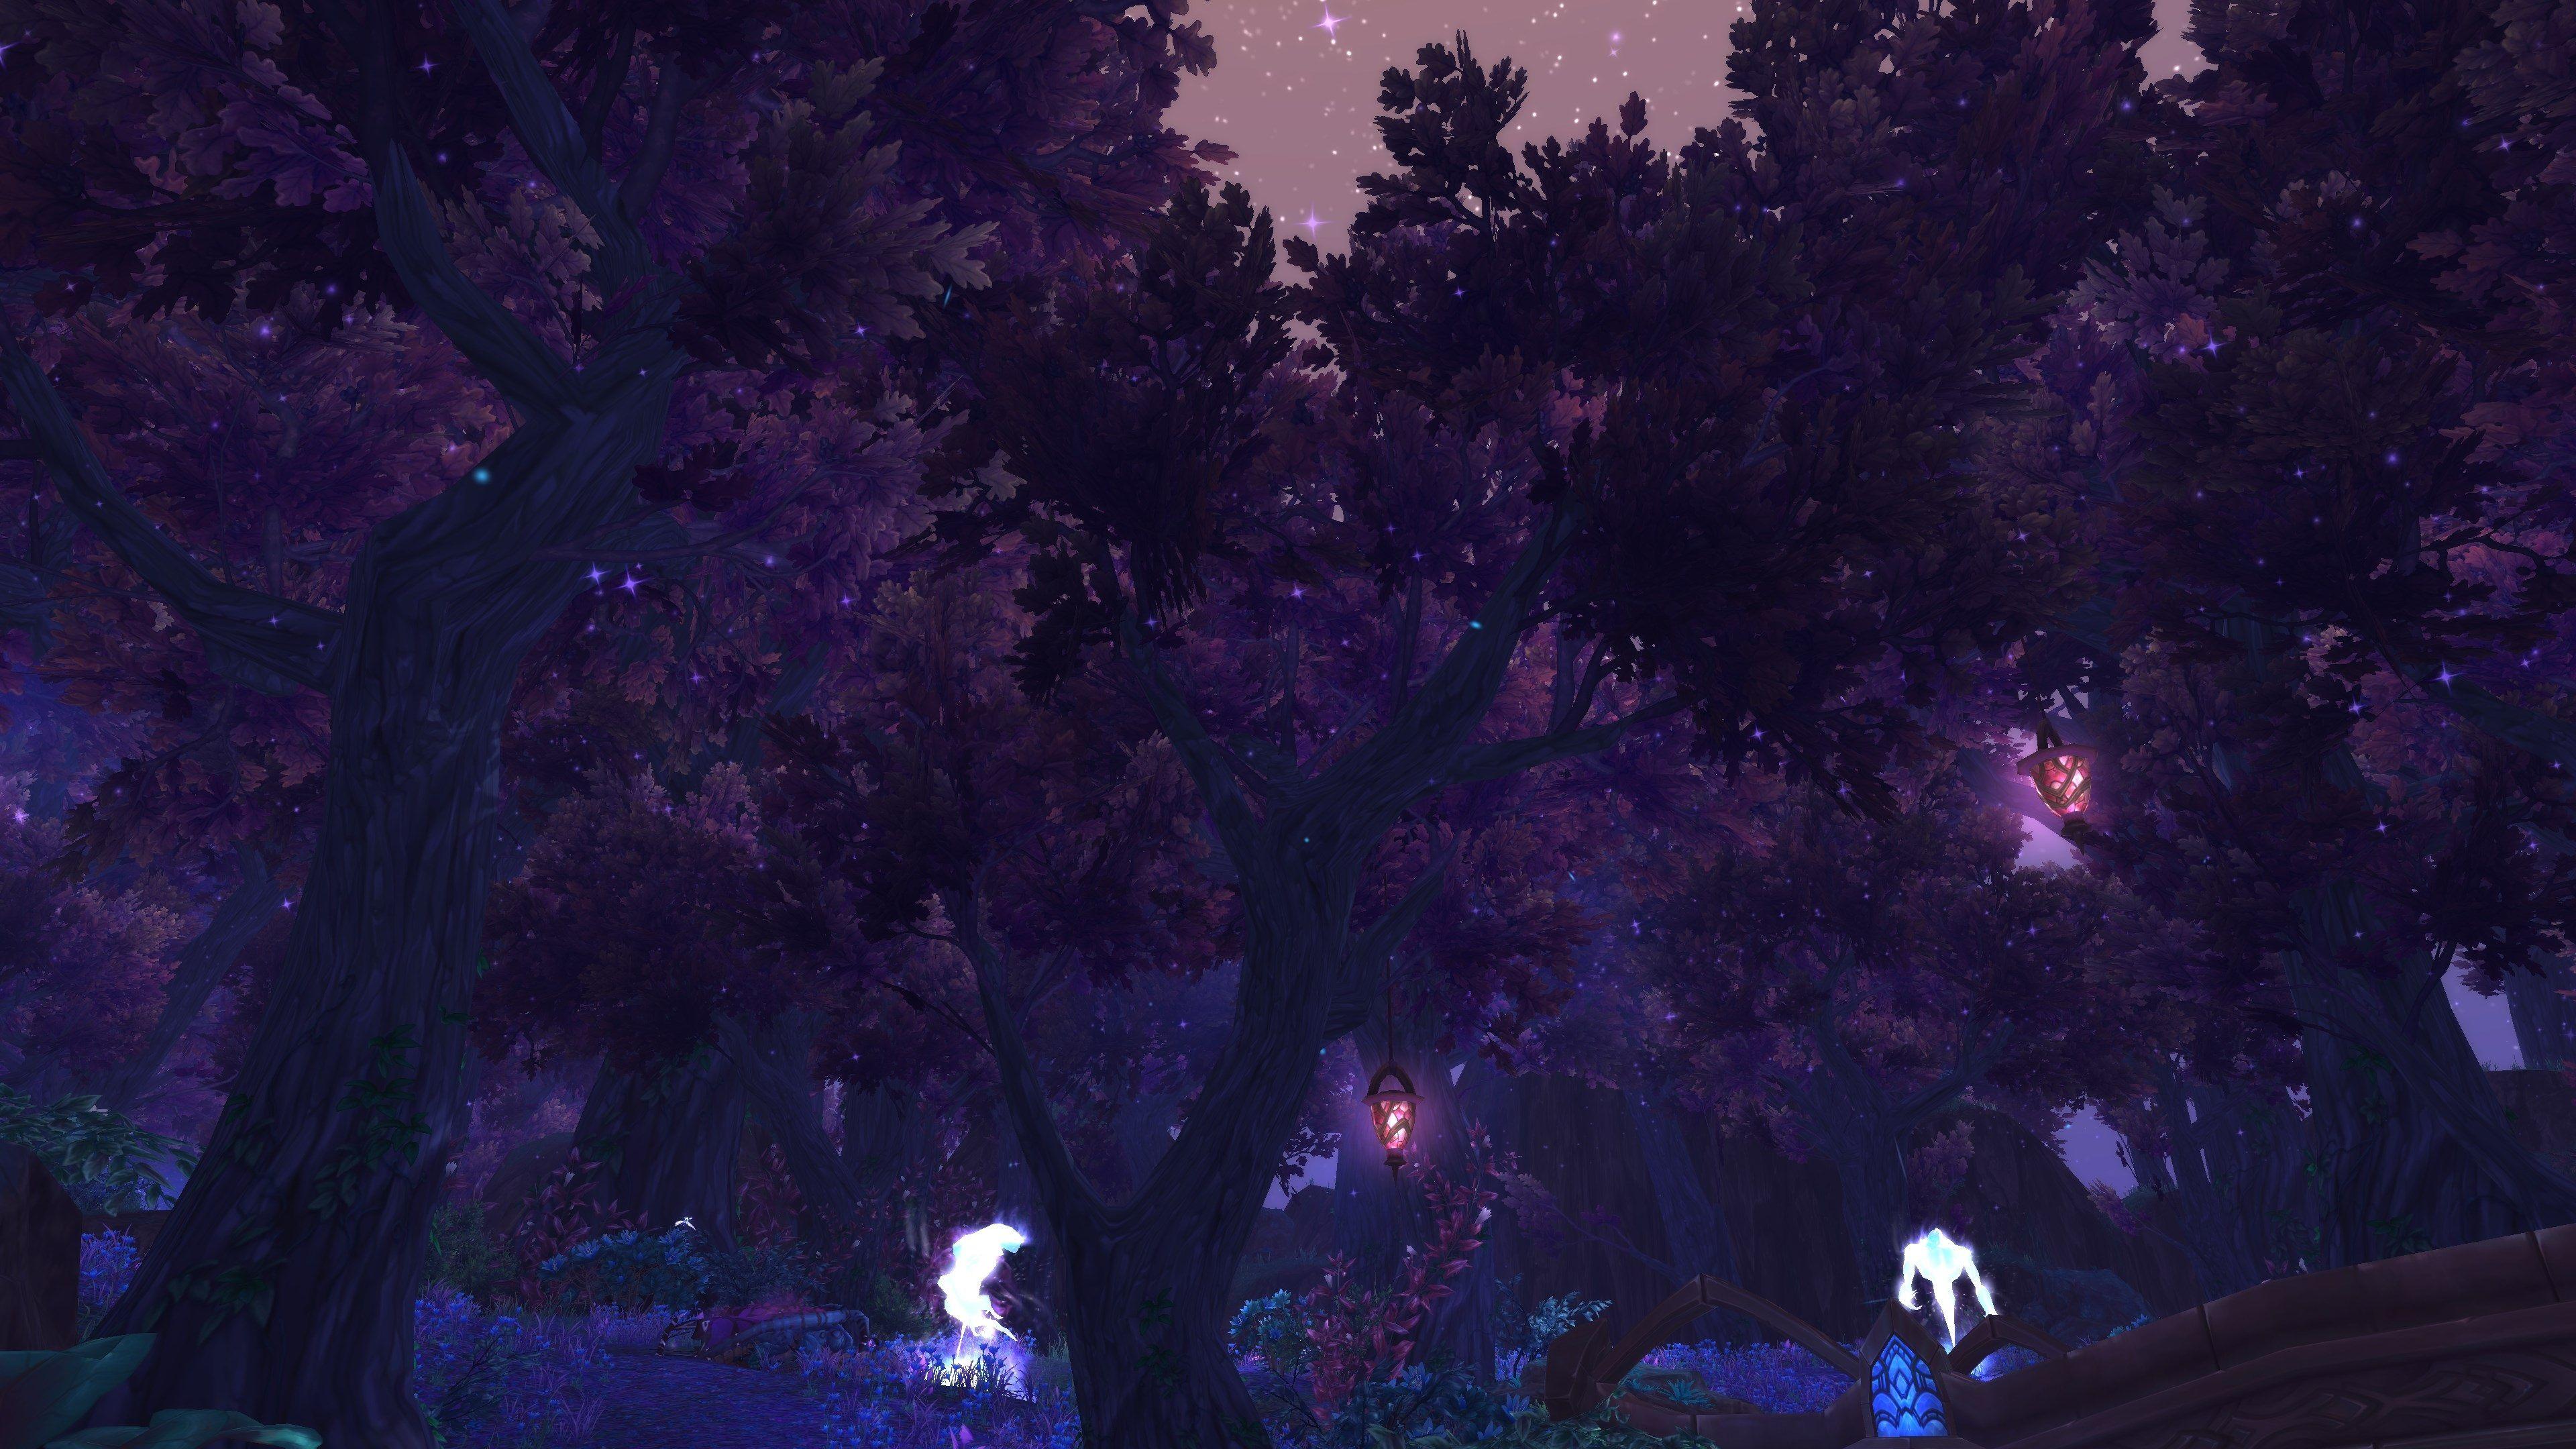 3840x2160 World Of Warcraft 4k Desktop Background Wallpaper Hd World Of Warcraft Wallpaper World Of Warcraft Game Desktop Wallpapers Backgrounds